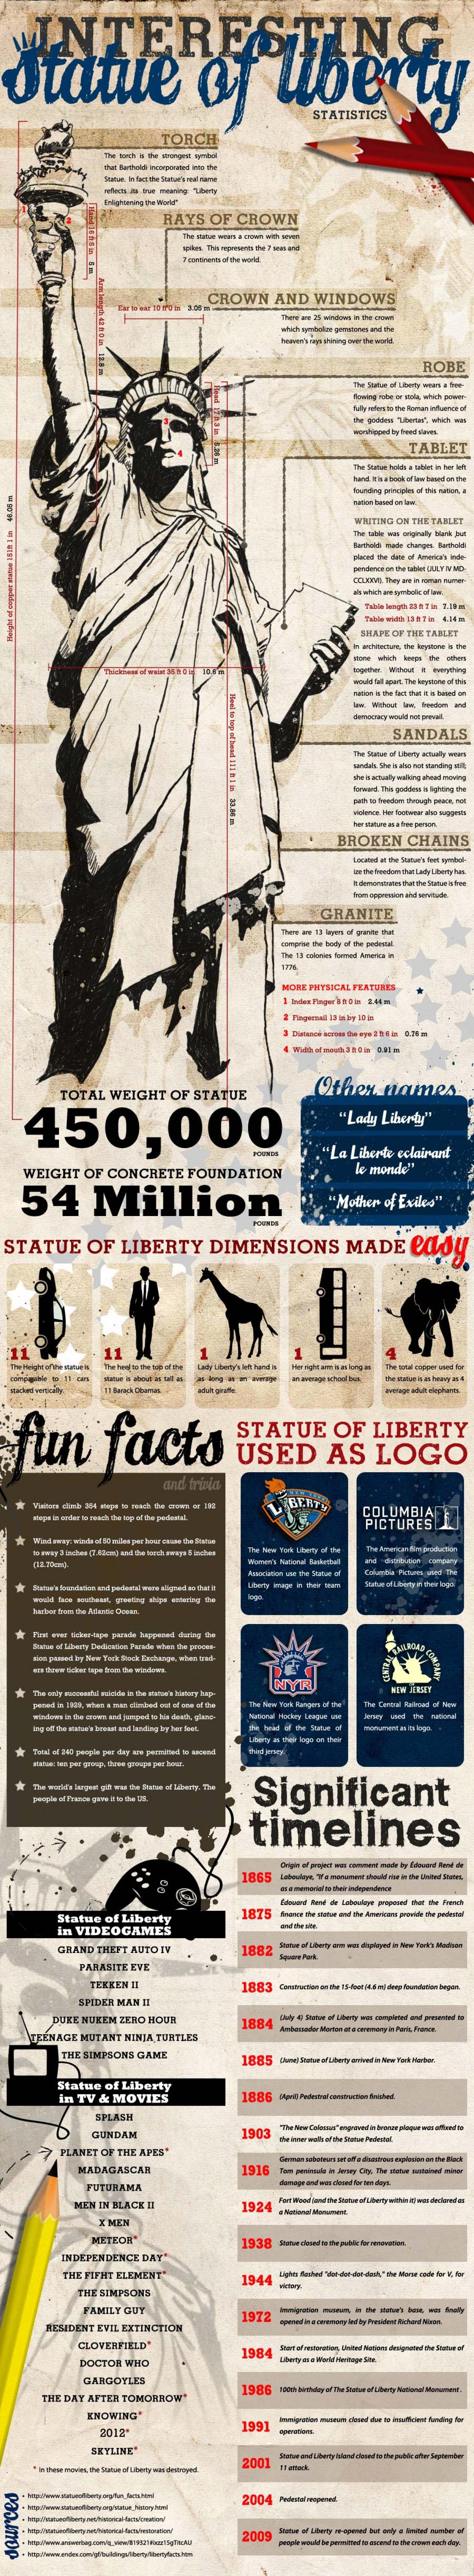 Interesting Statue Of Liberty Statistics Infographic